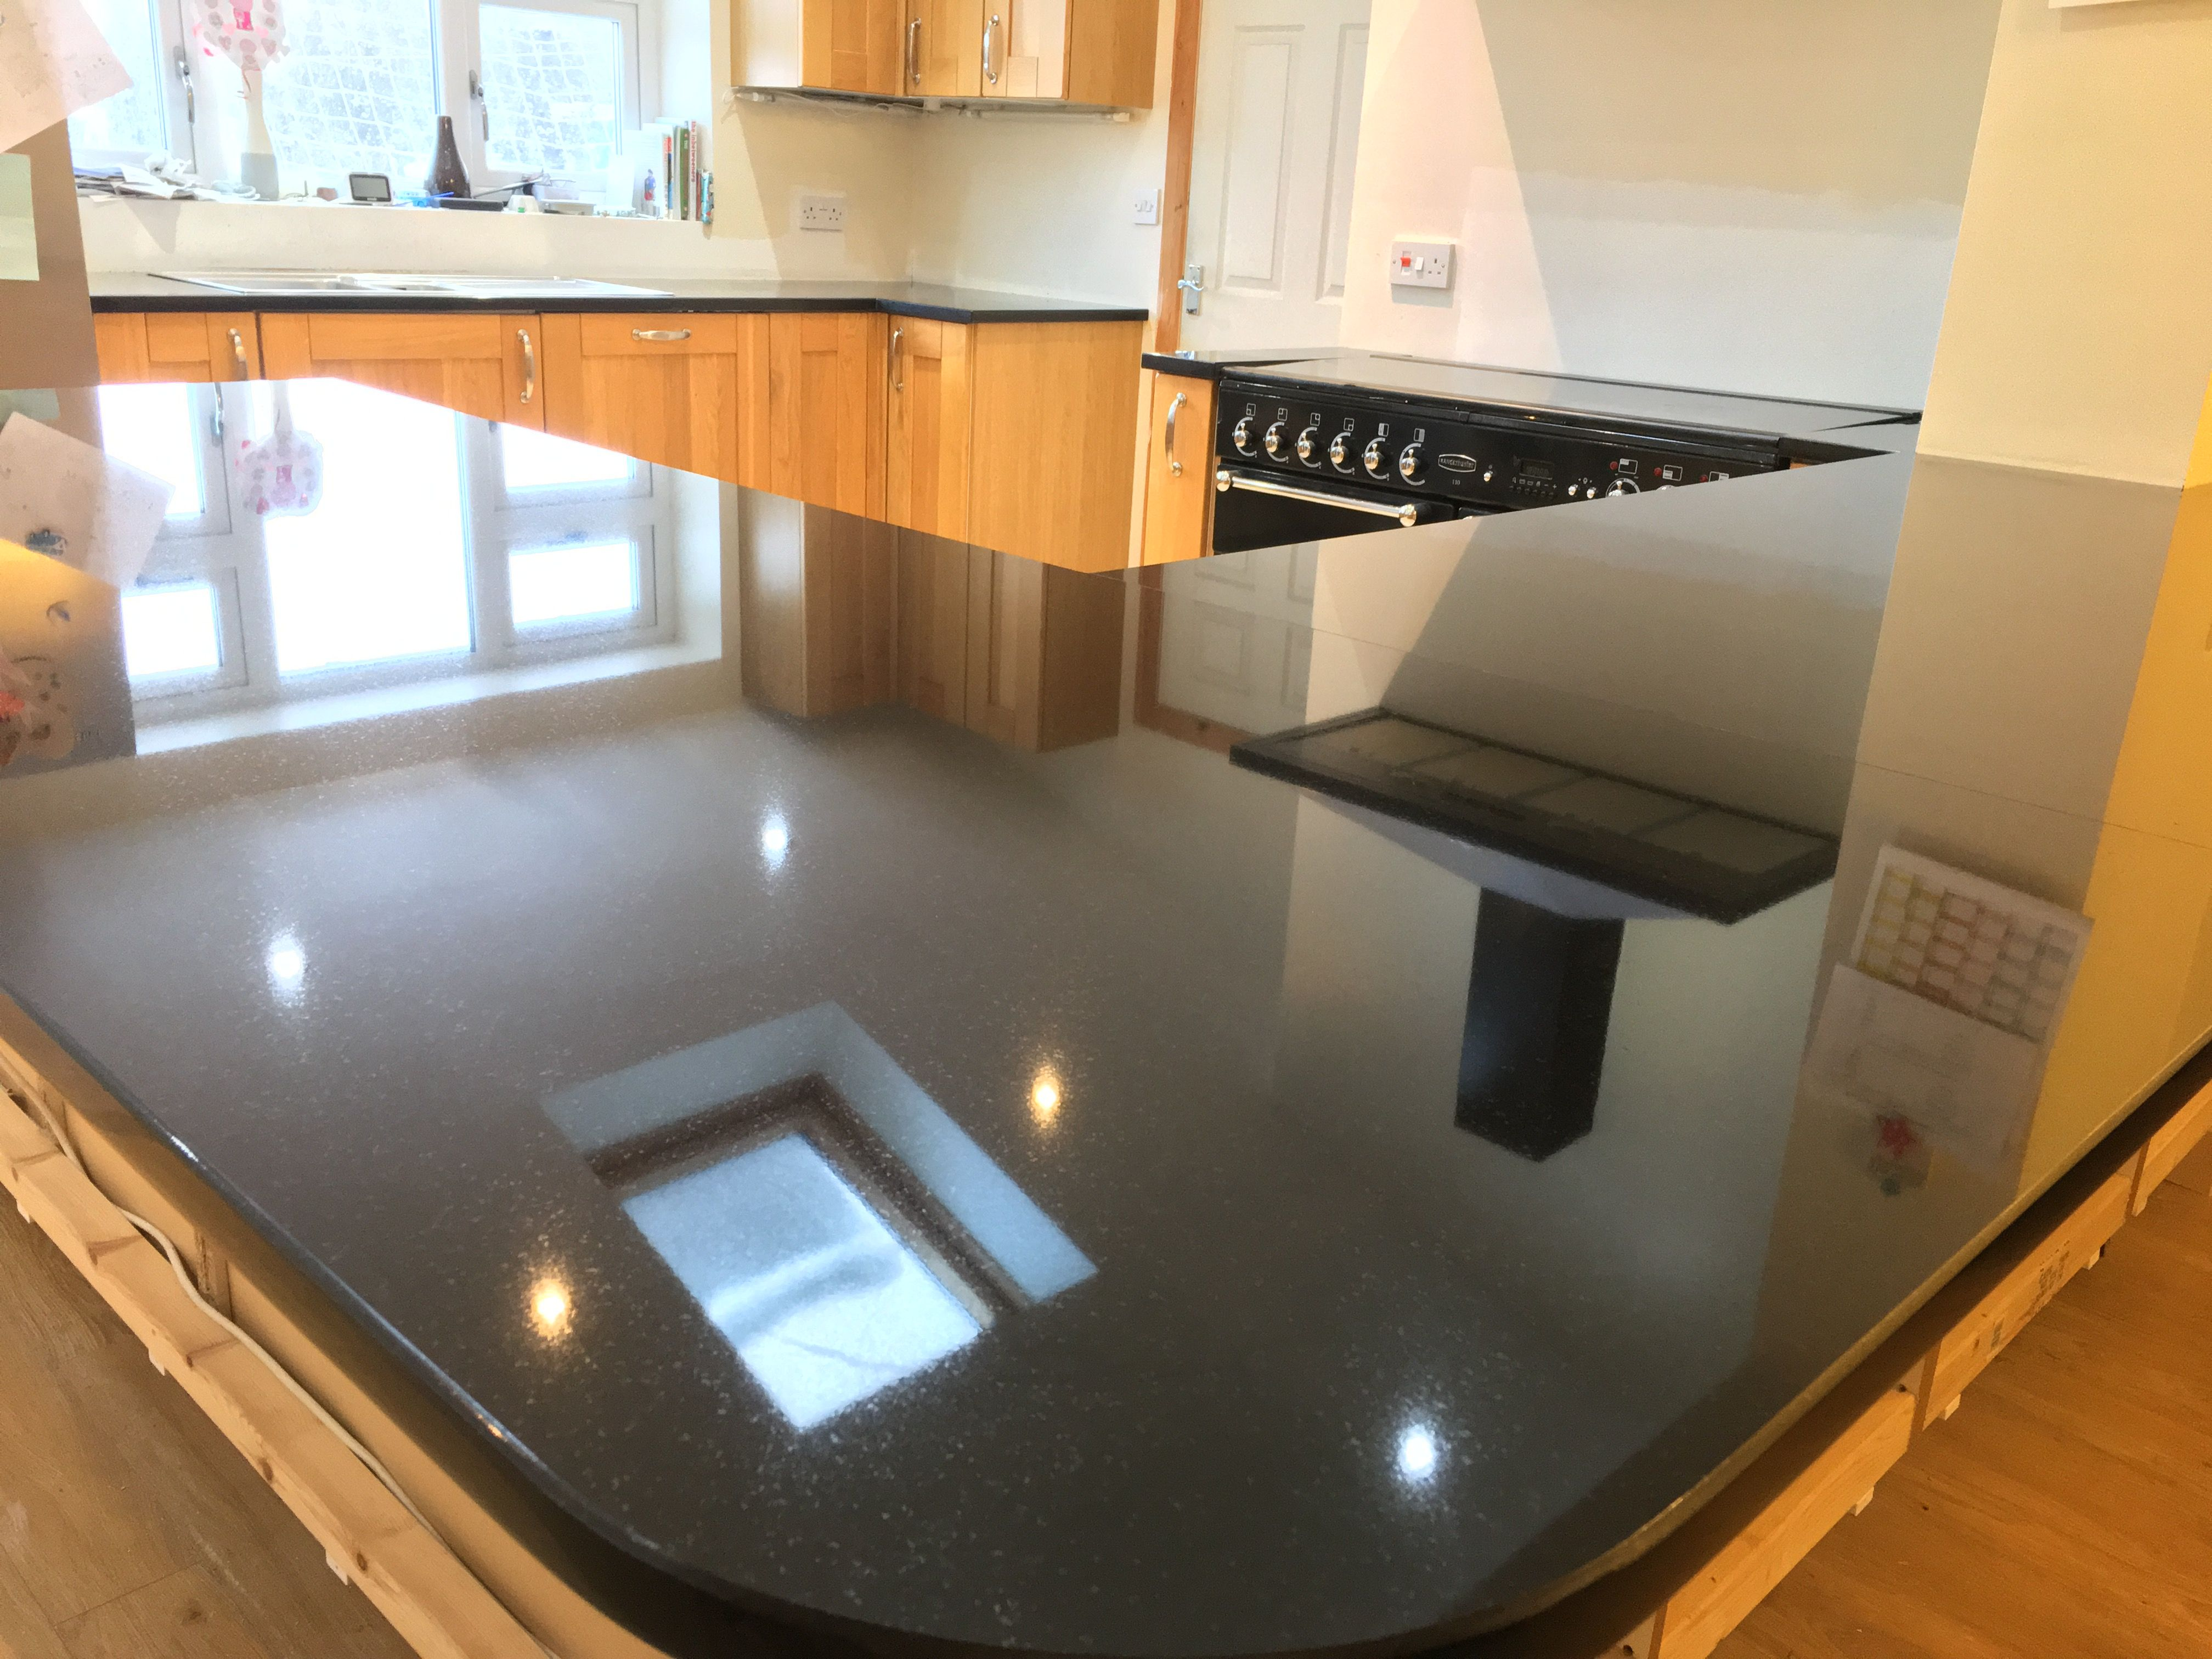 Nero Zimbabwe Granite Worktops With A Oak Kitchen In North